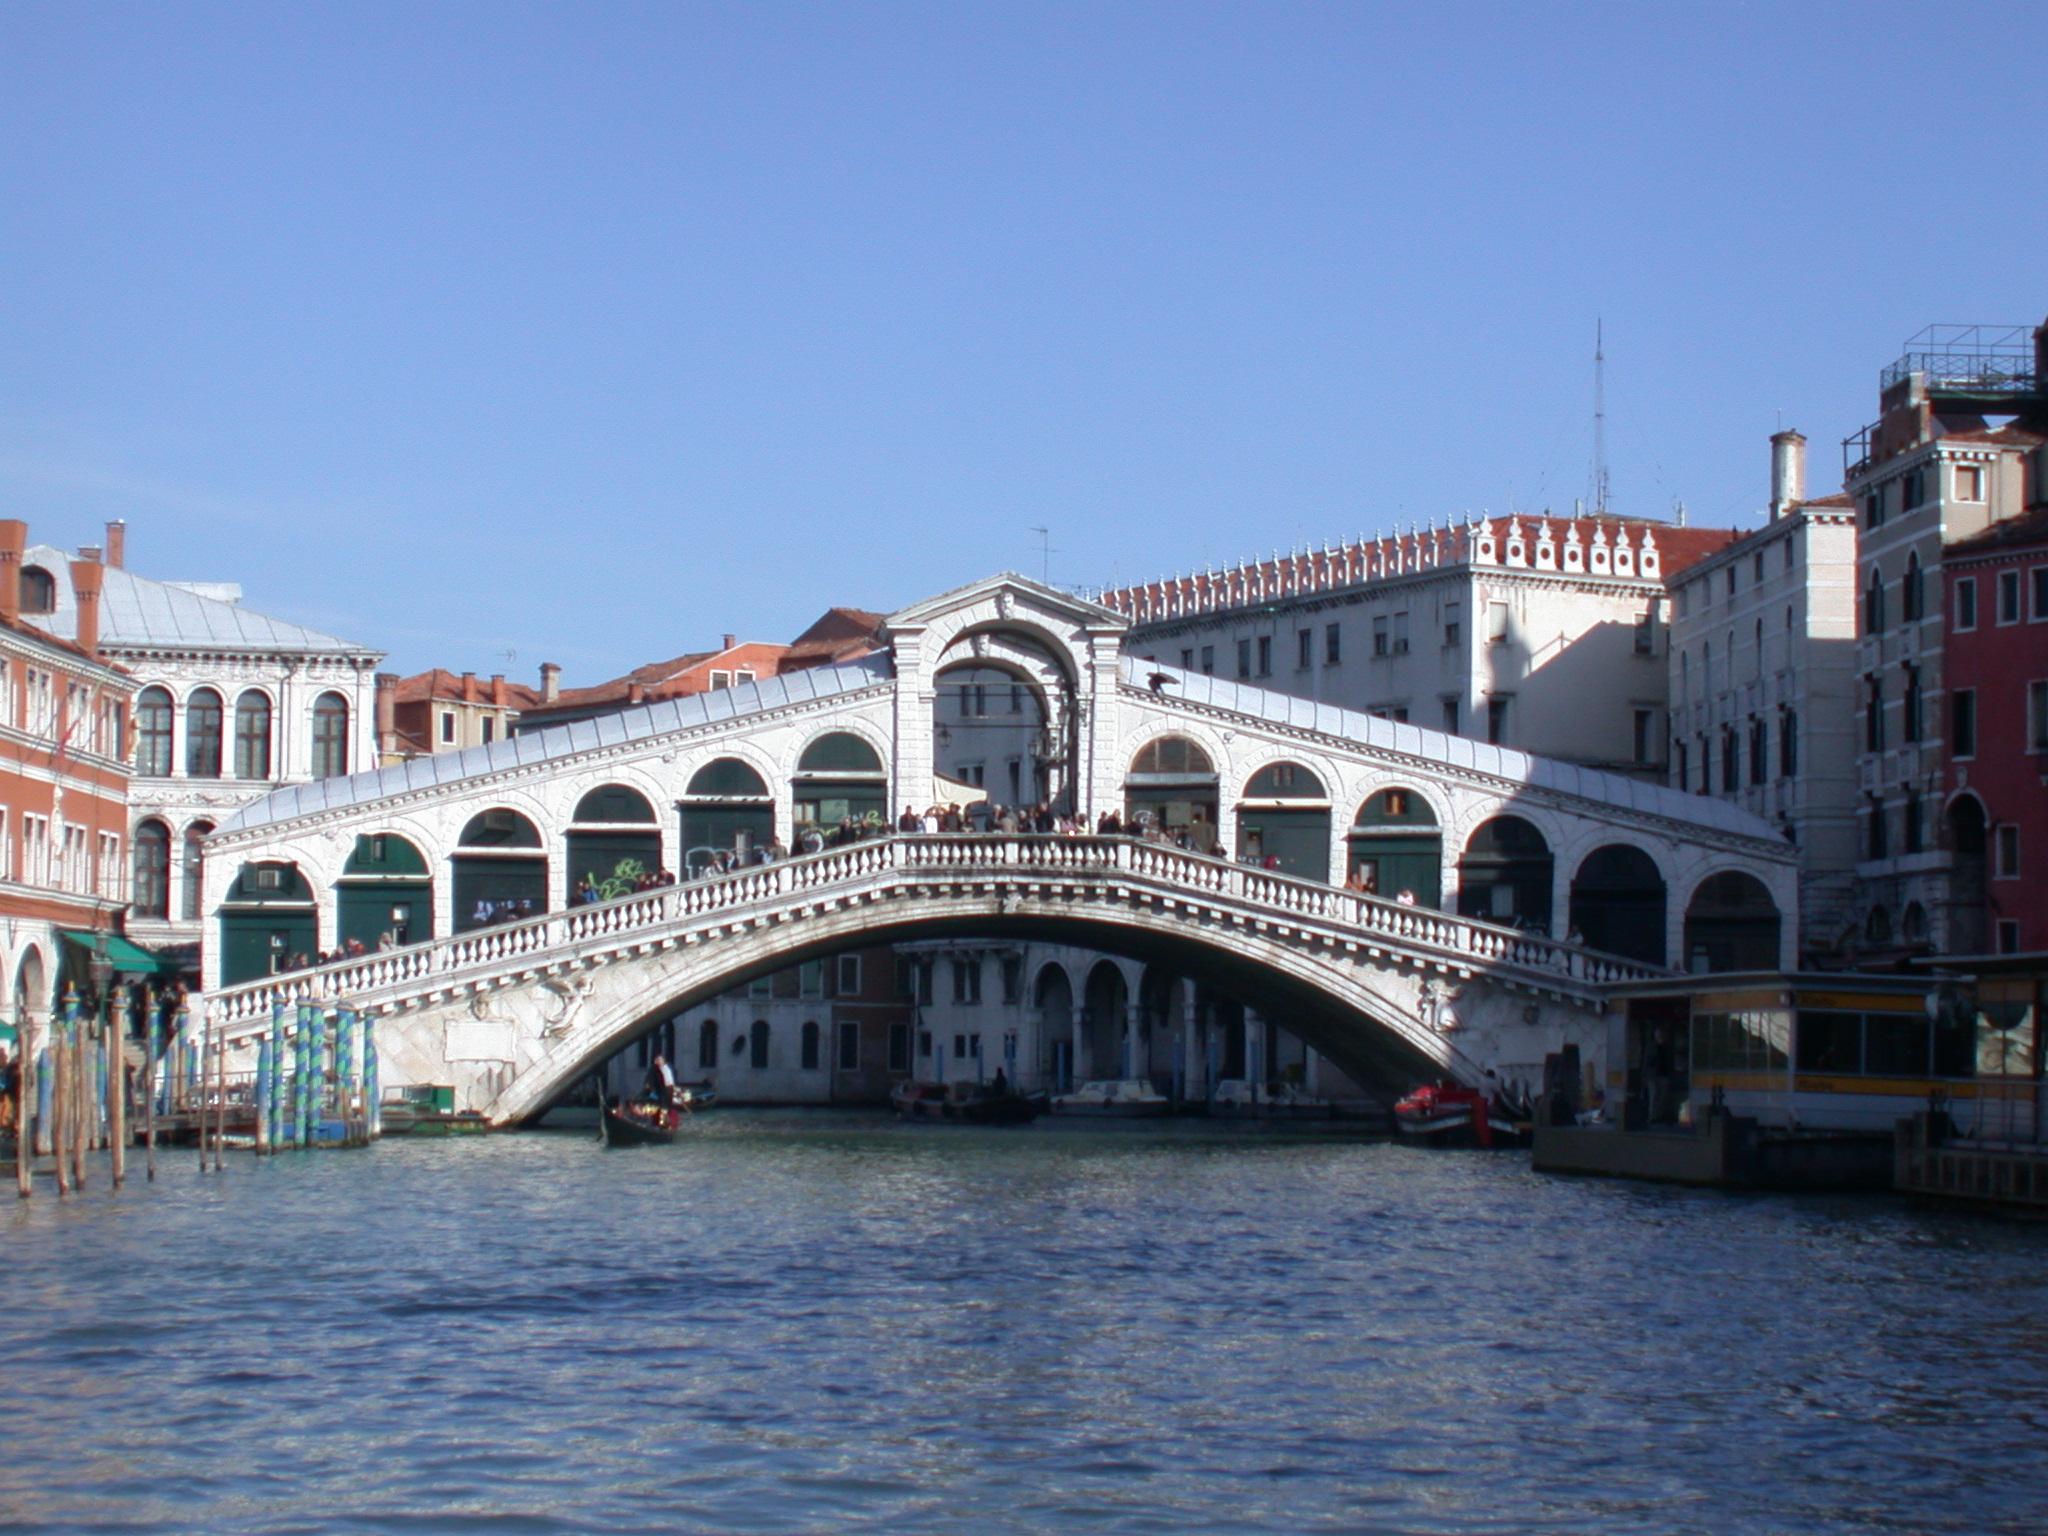 https://upload.wikimedia.org/wikipedia/commons/9/95/Venezia_-_Ponte_di_Rialto.jpg